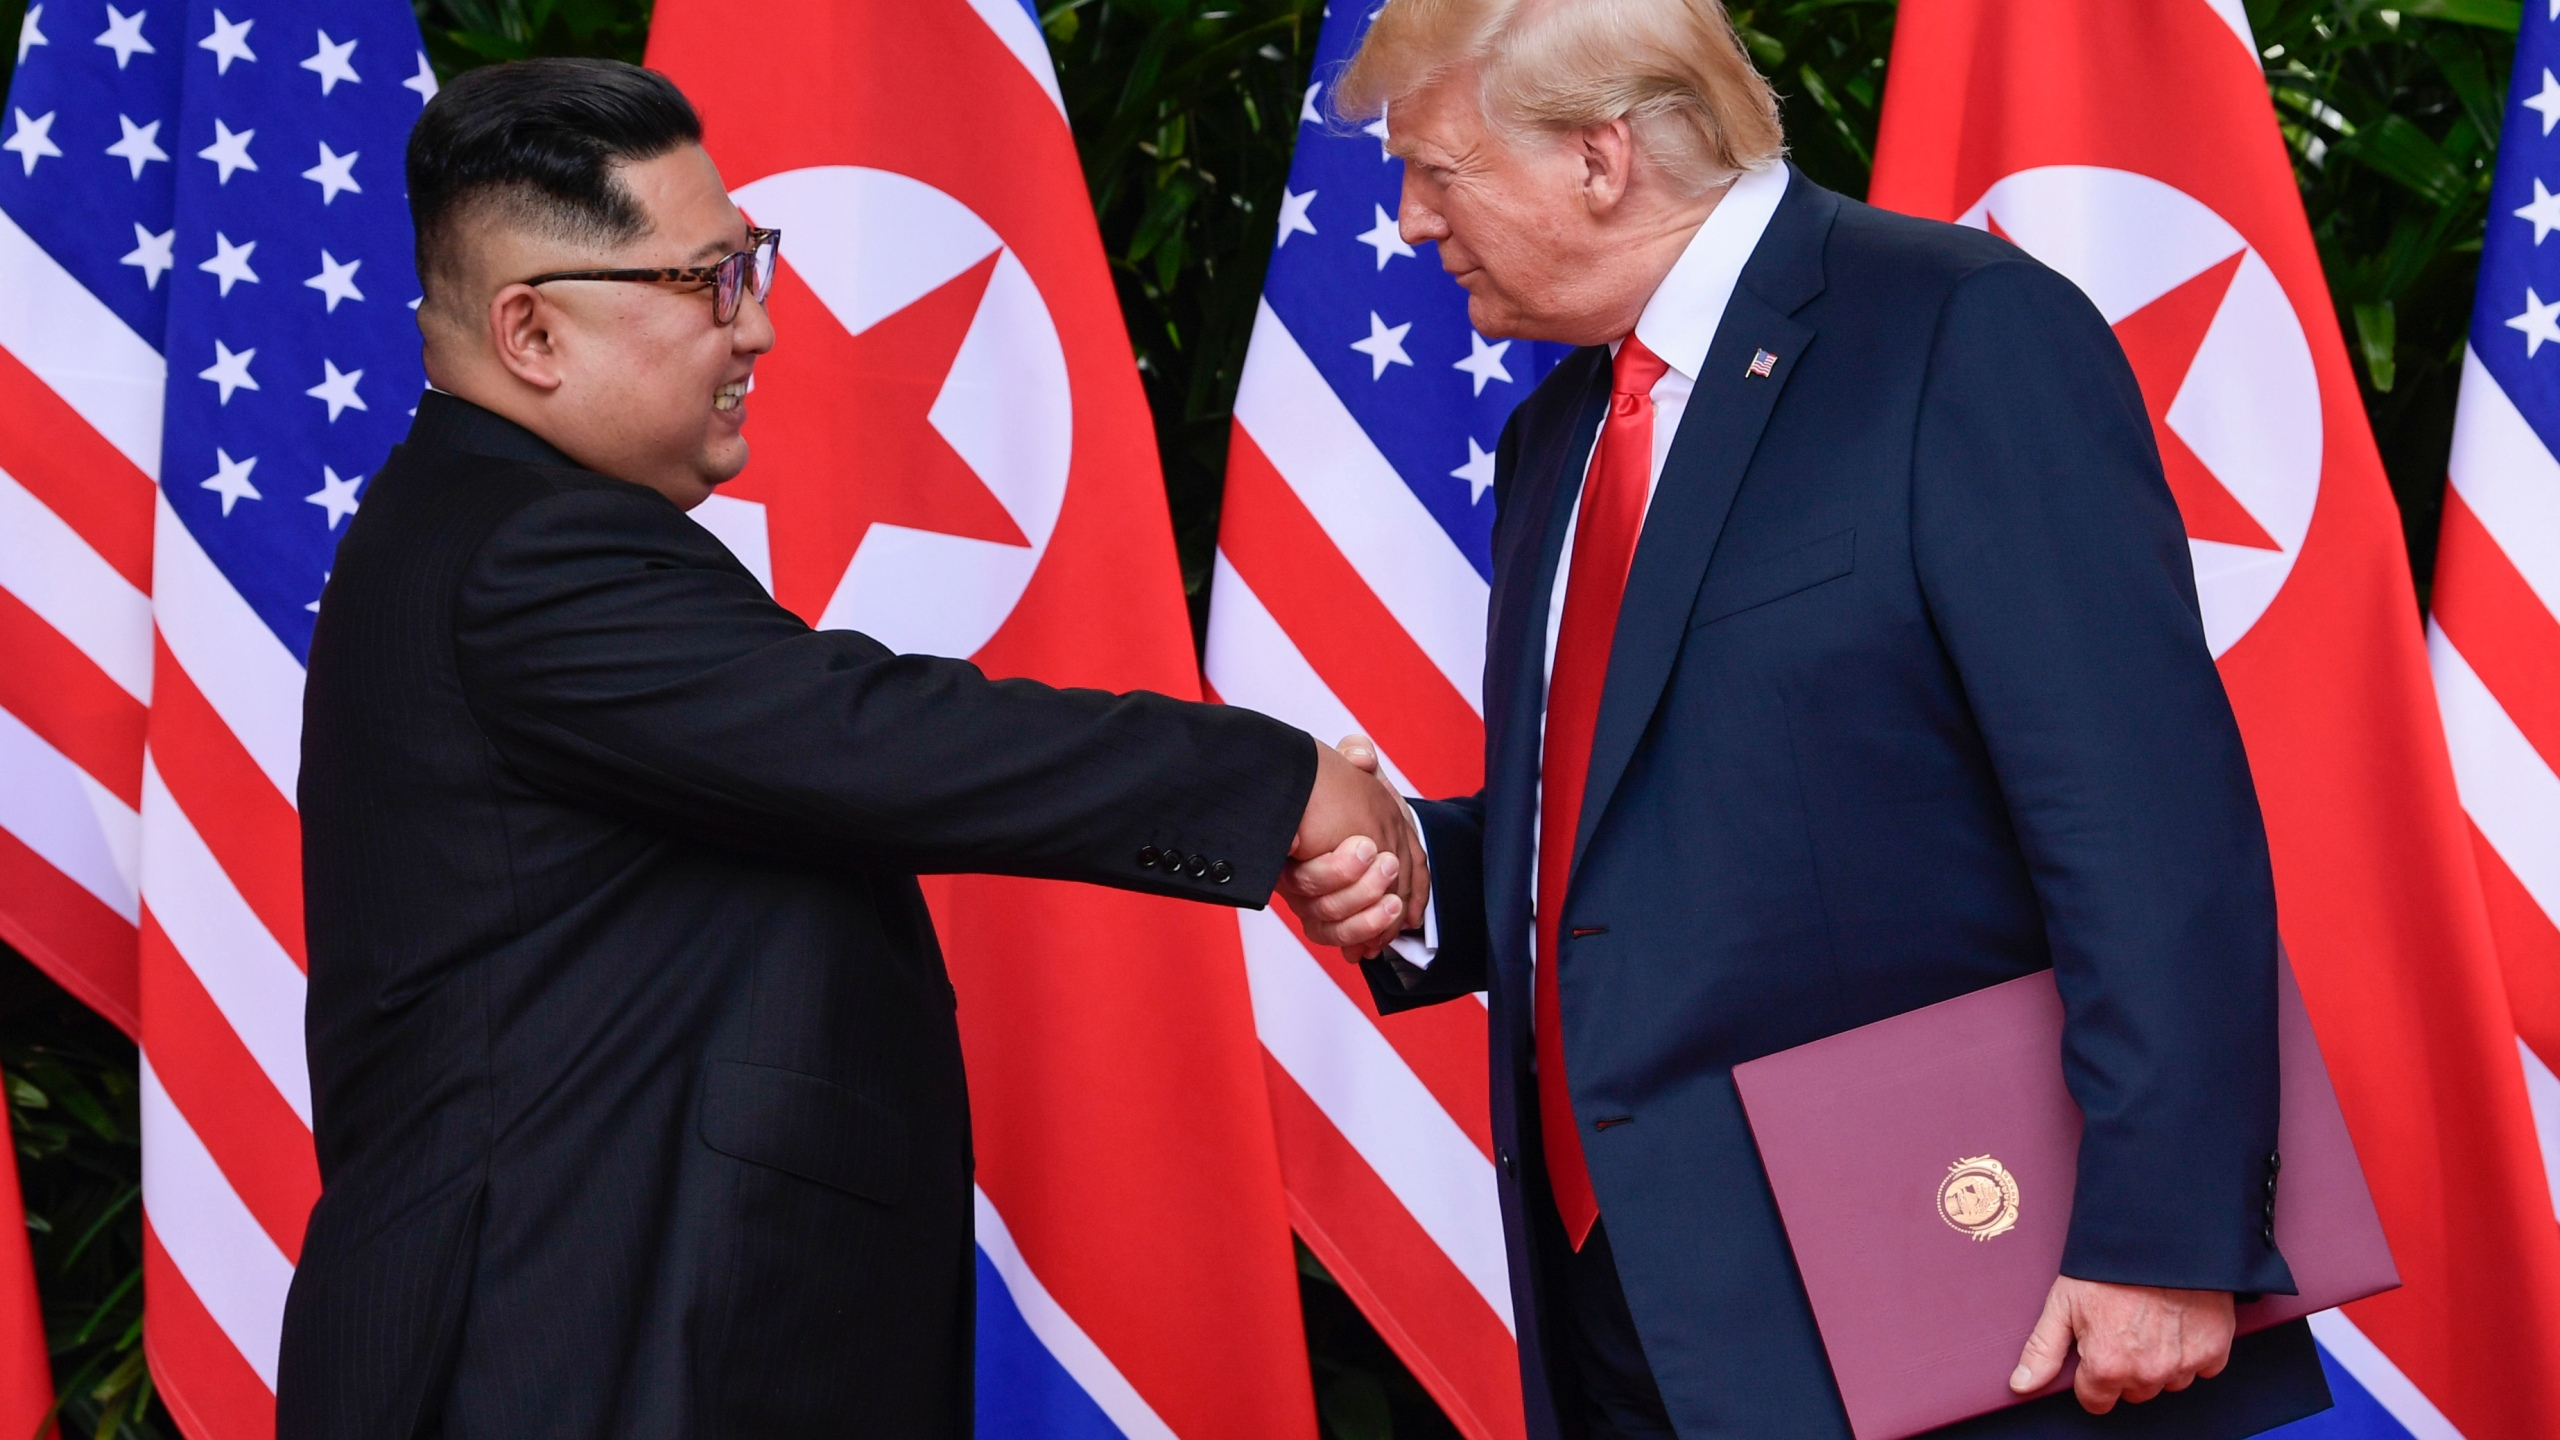 North_Korea_US_Analysis_31829-159532.jpg57633771